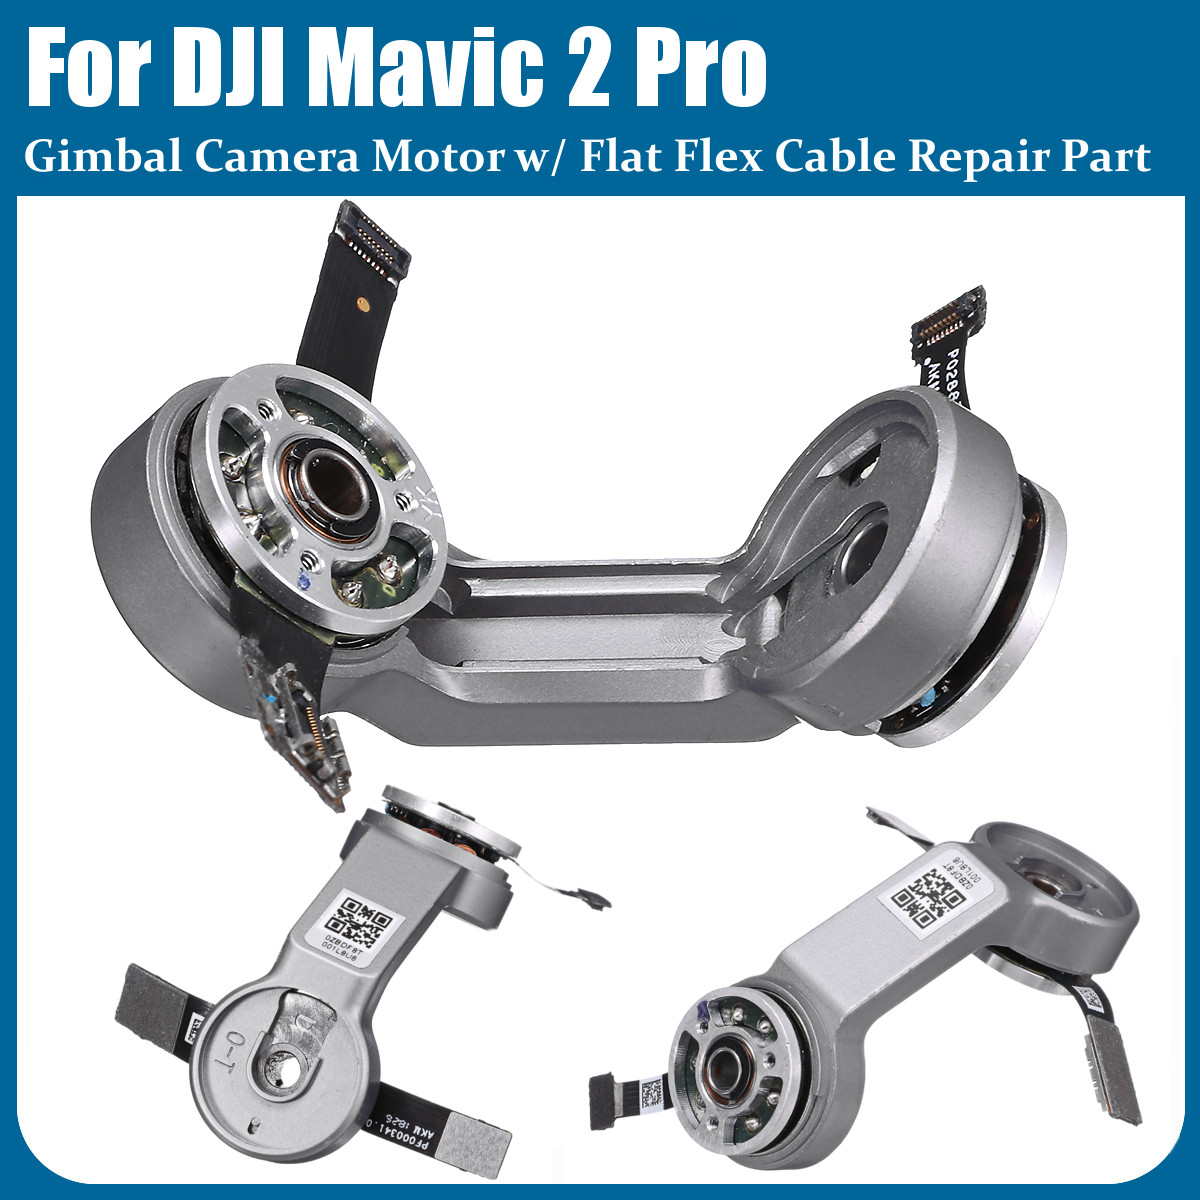 Repair Parts For DJI Mavic 2 Pro Gimbal Motor Replacement For DJI Mavic 2 Zoom Gimbal Accessories